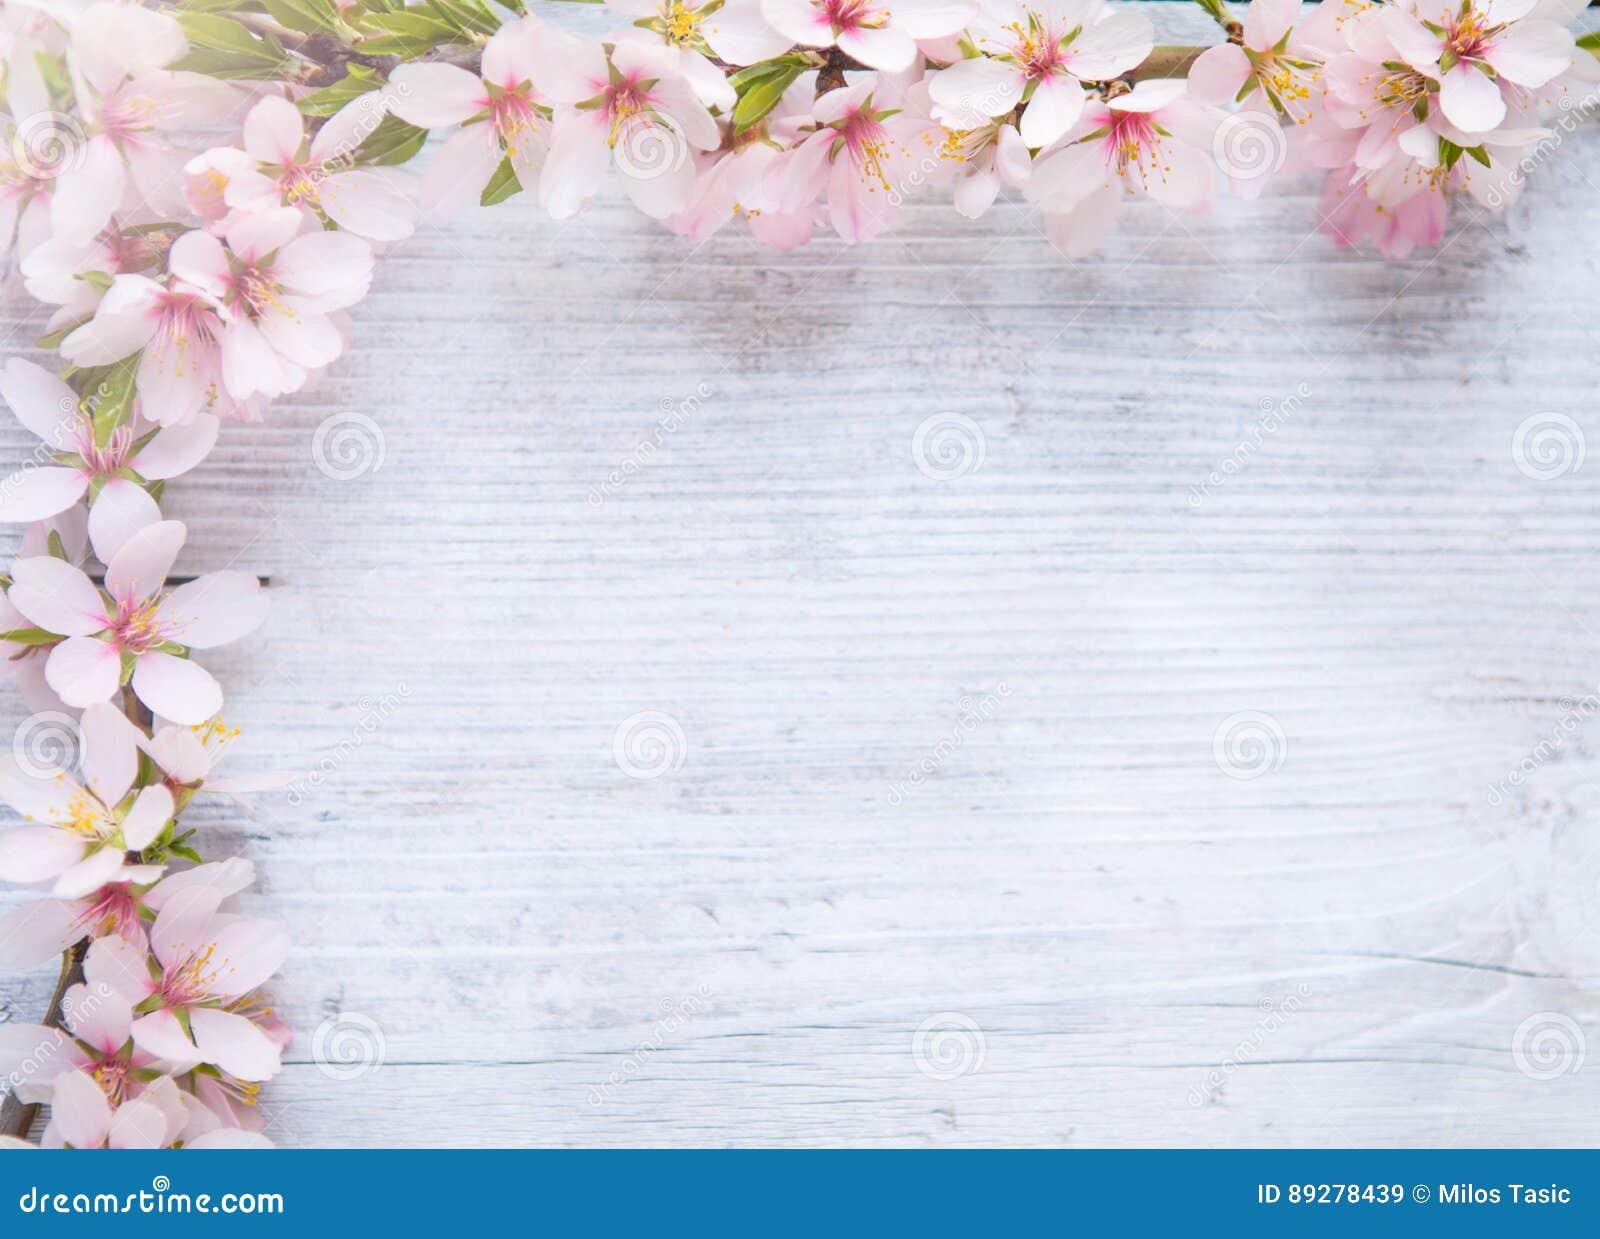 Spring Border Background With White Blossom Stock Image Image Of Springtime White 89278439 Spring bouquet printable flower border spring flowers digital | etsy. dreamstime com